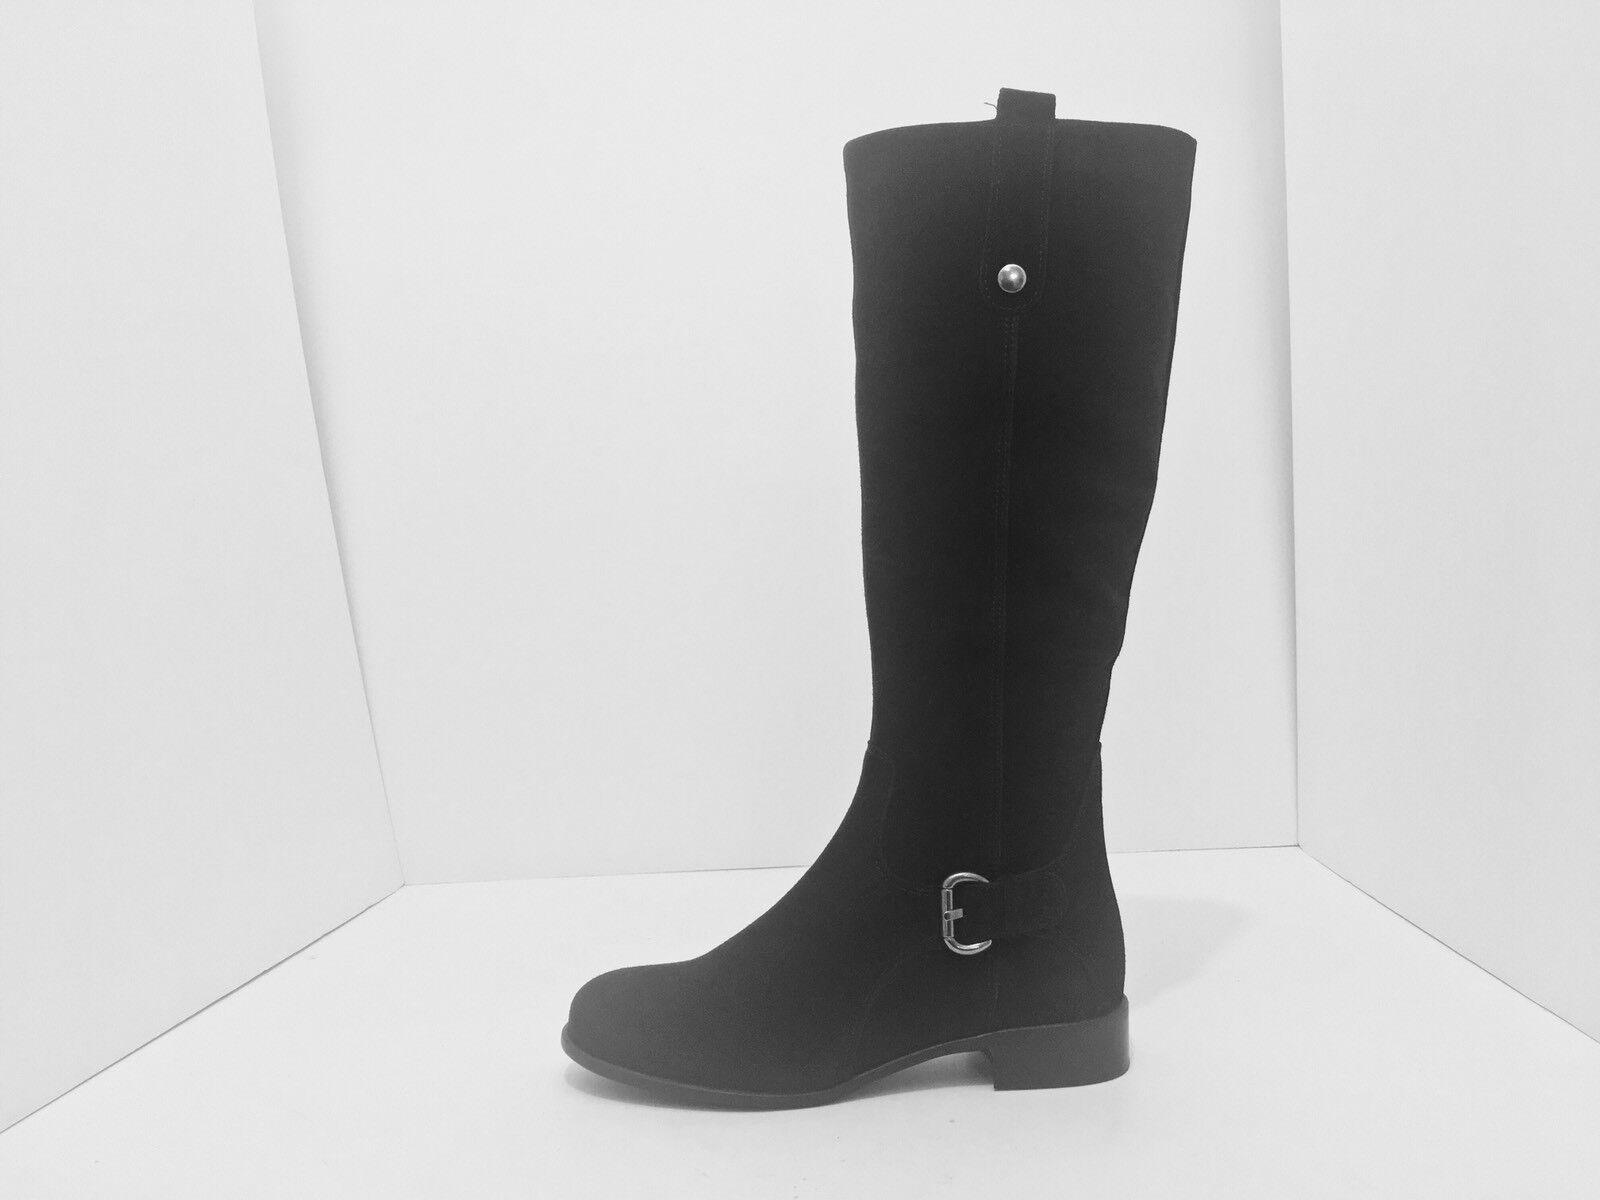 La Canadienne Stefanie Black Suede Women's Knee High Low Heel Boots Size 5 M